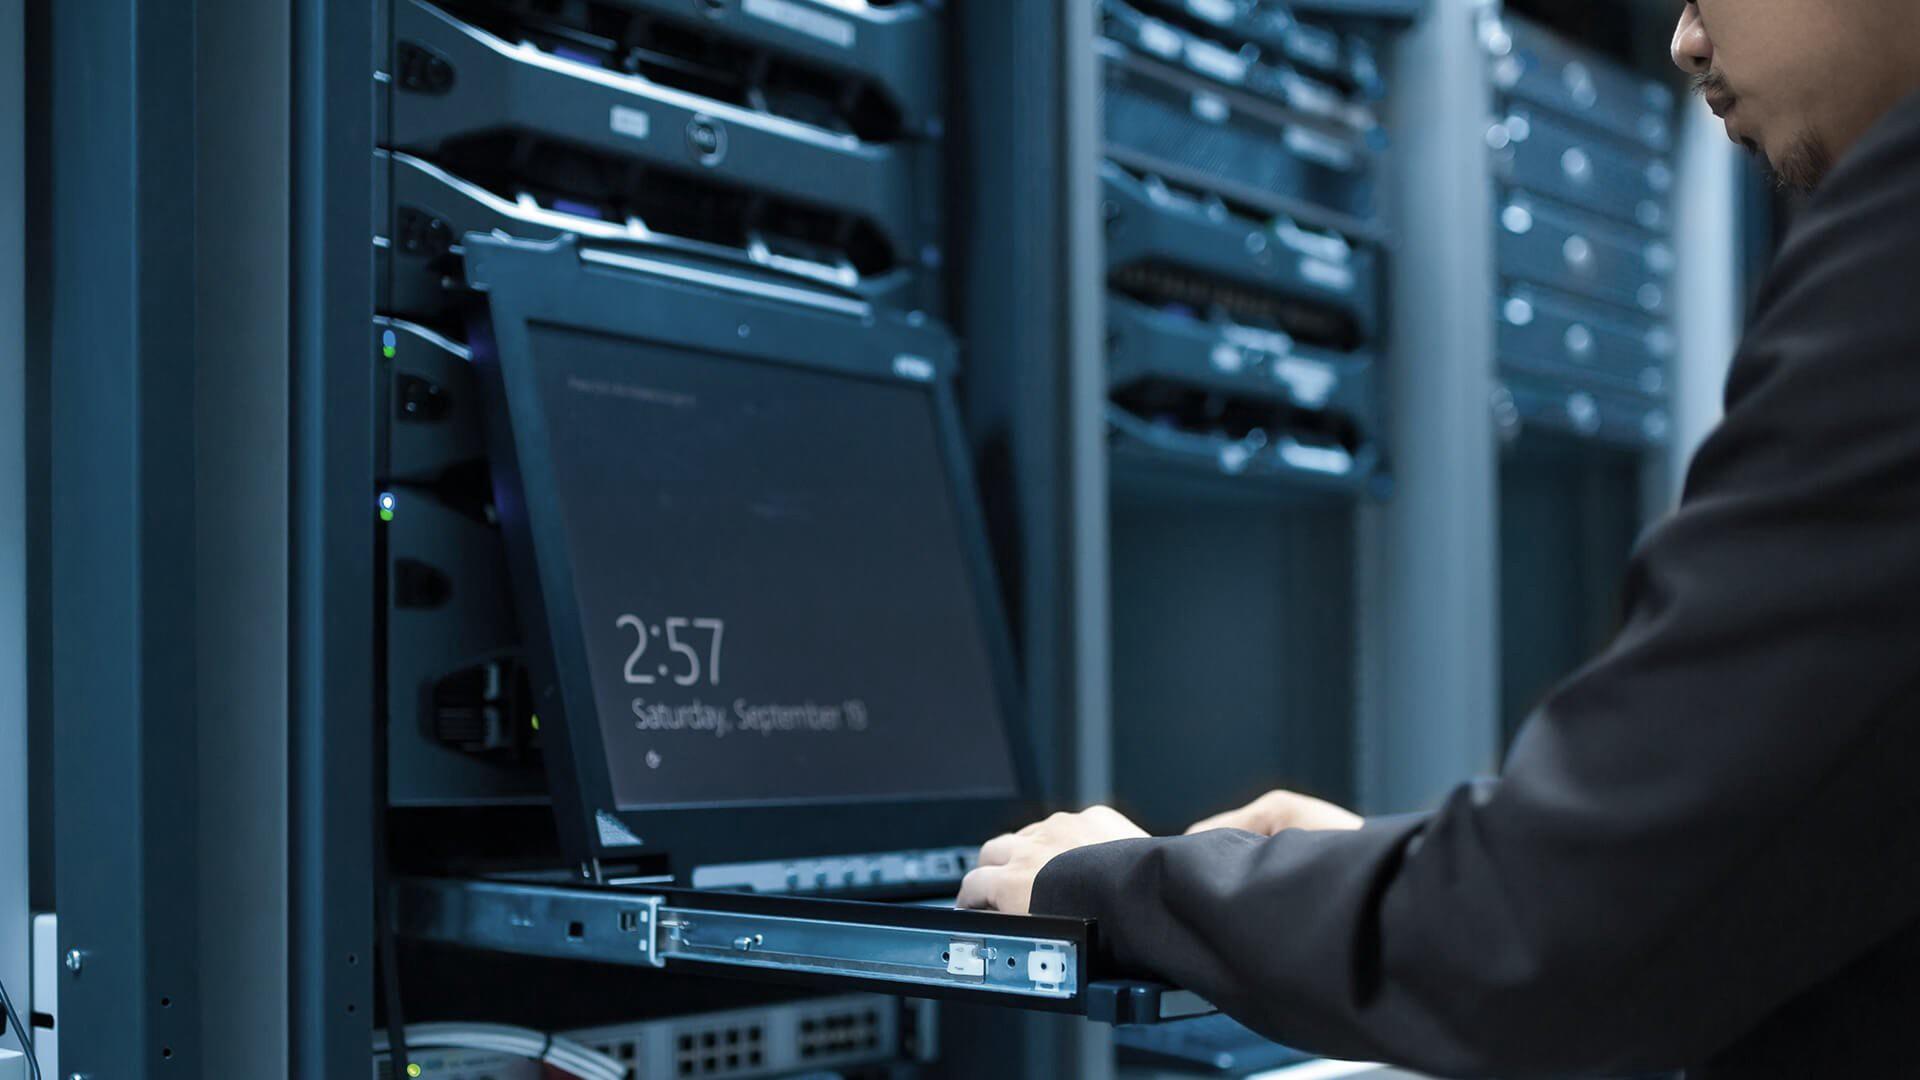 Webbhotell, vps server, hosting, domännamn-